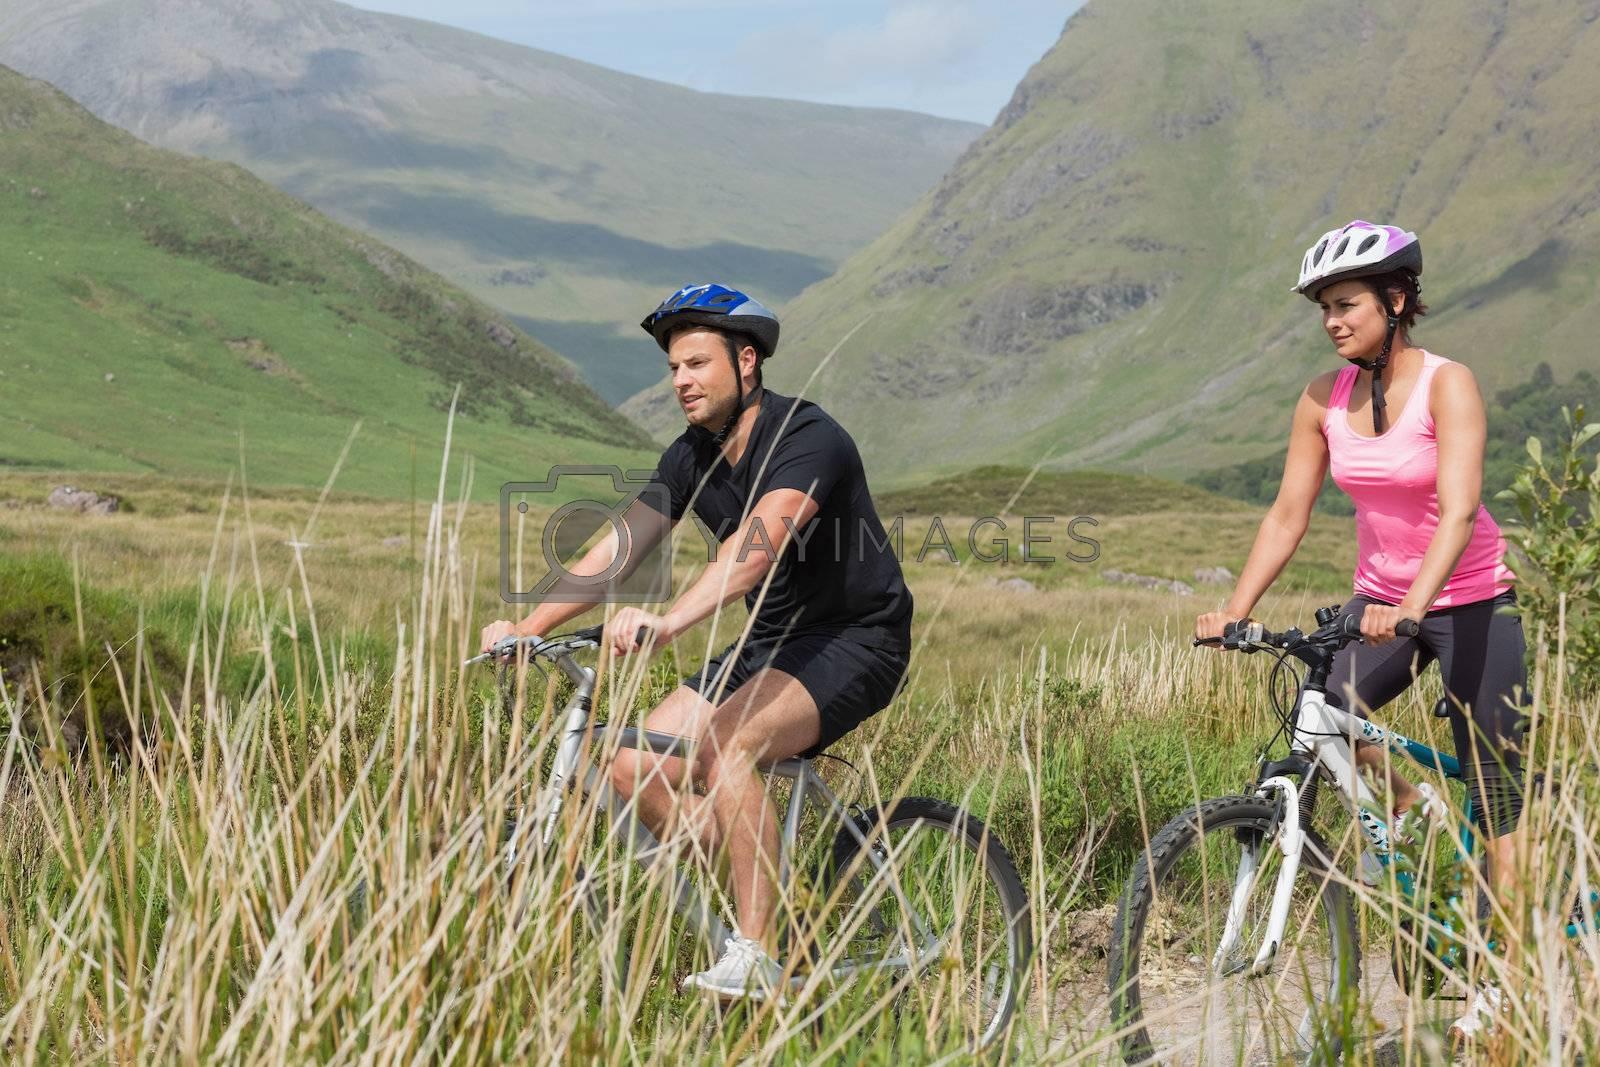 Athletic couple biking through countryside by Wavebreakmedia